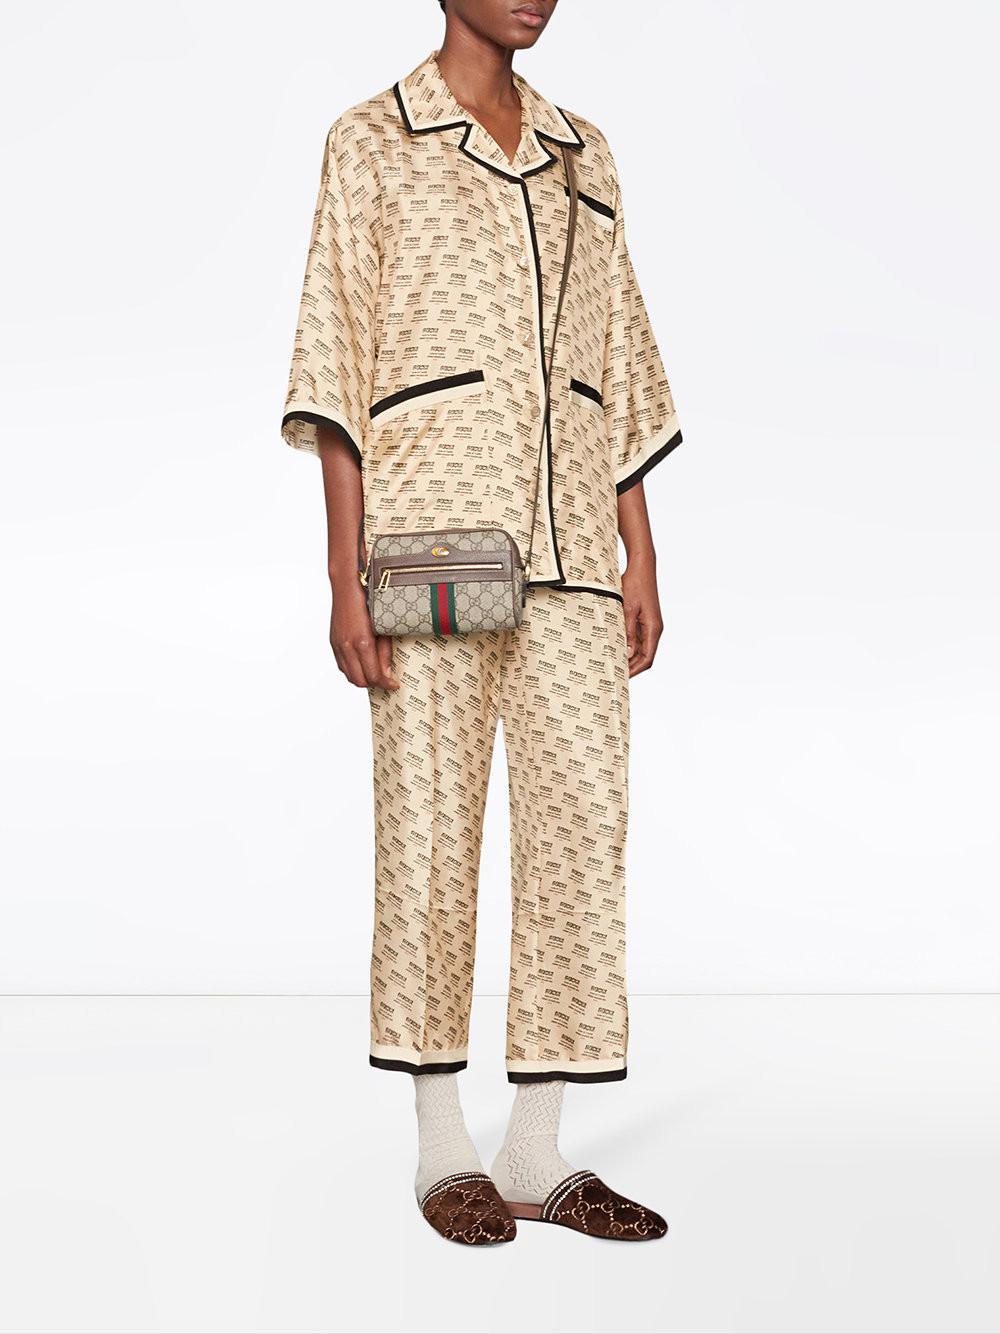 426440d8a57 Lyst - Gucci Invite Stamp Silk Shirt - Save 36%